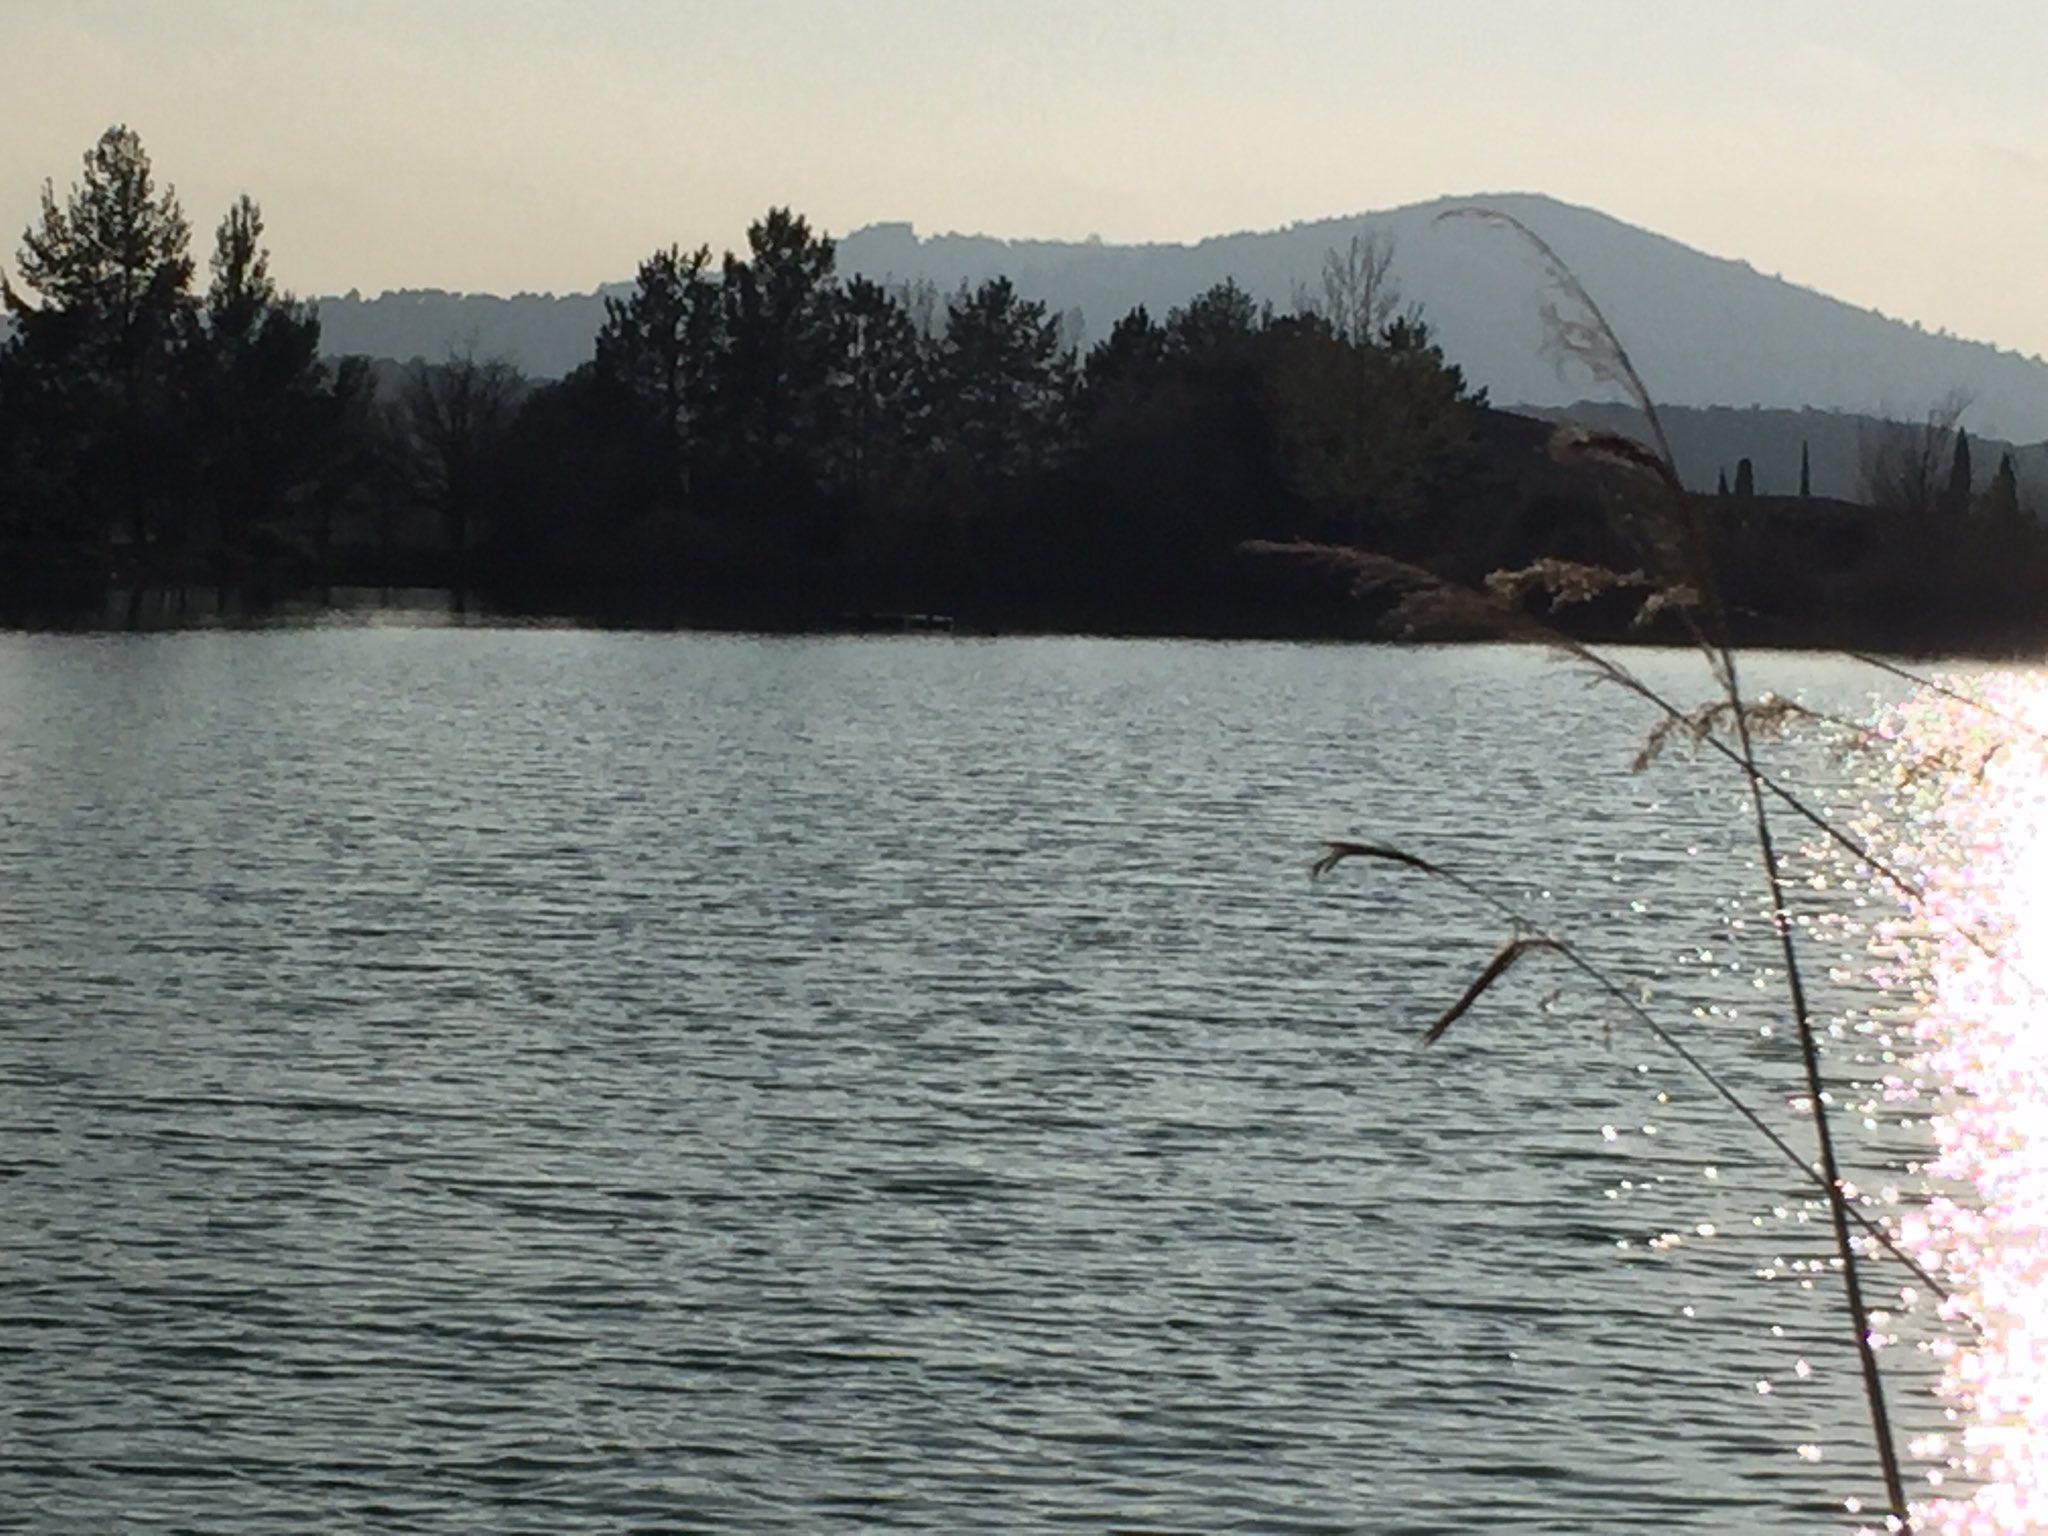 Lac Domaine de Pont Royal. https://t.co/v0seHxLZUo